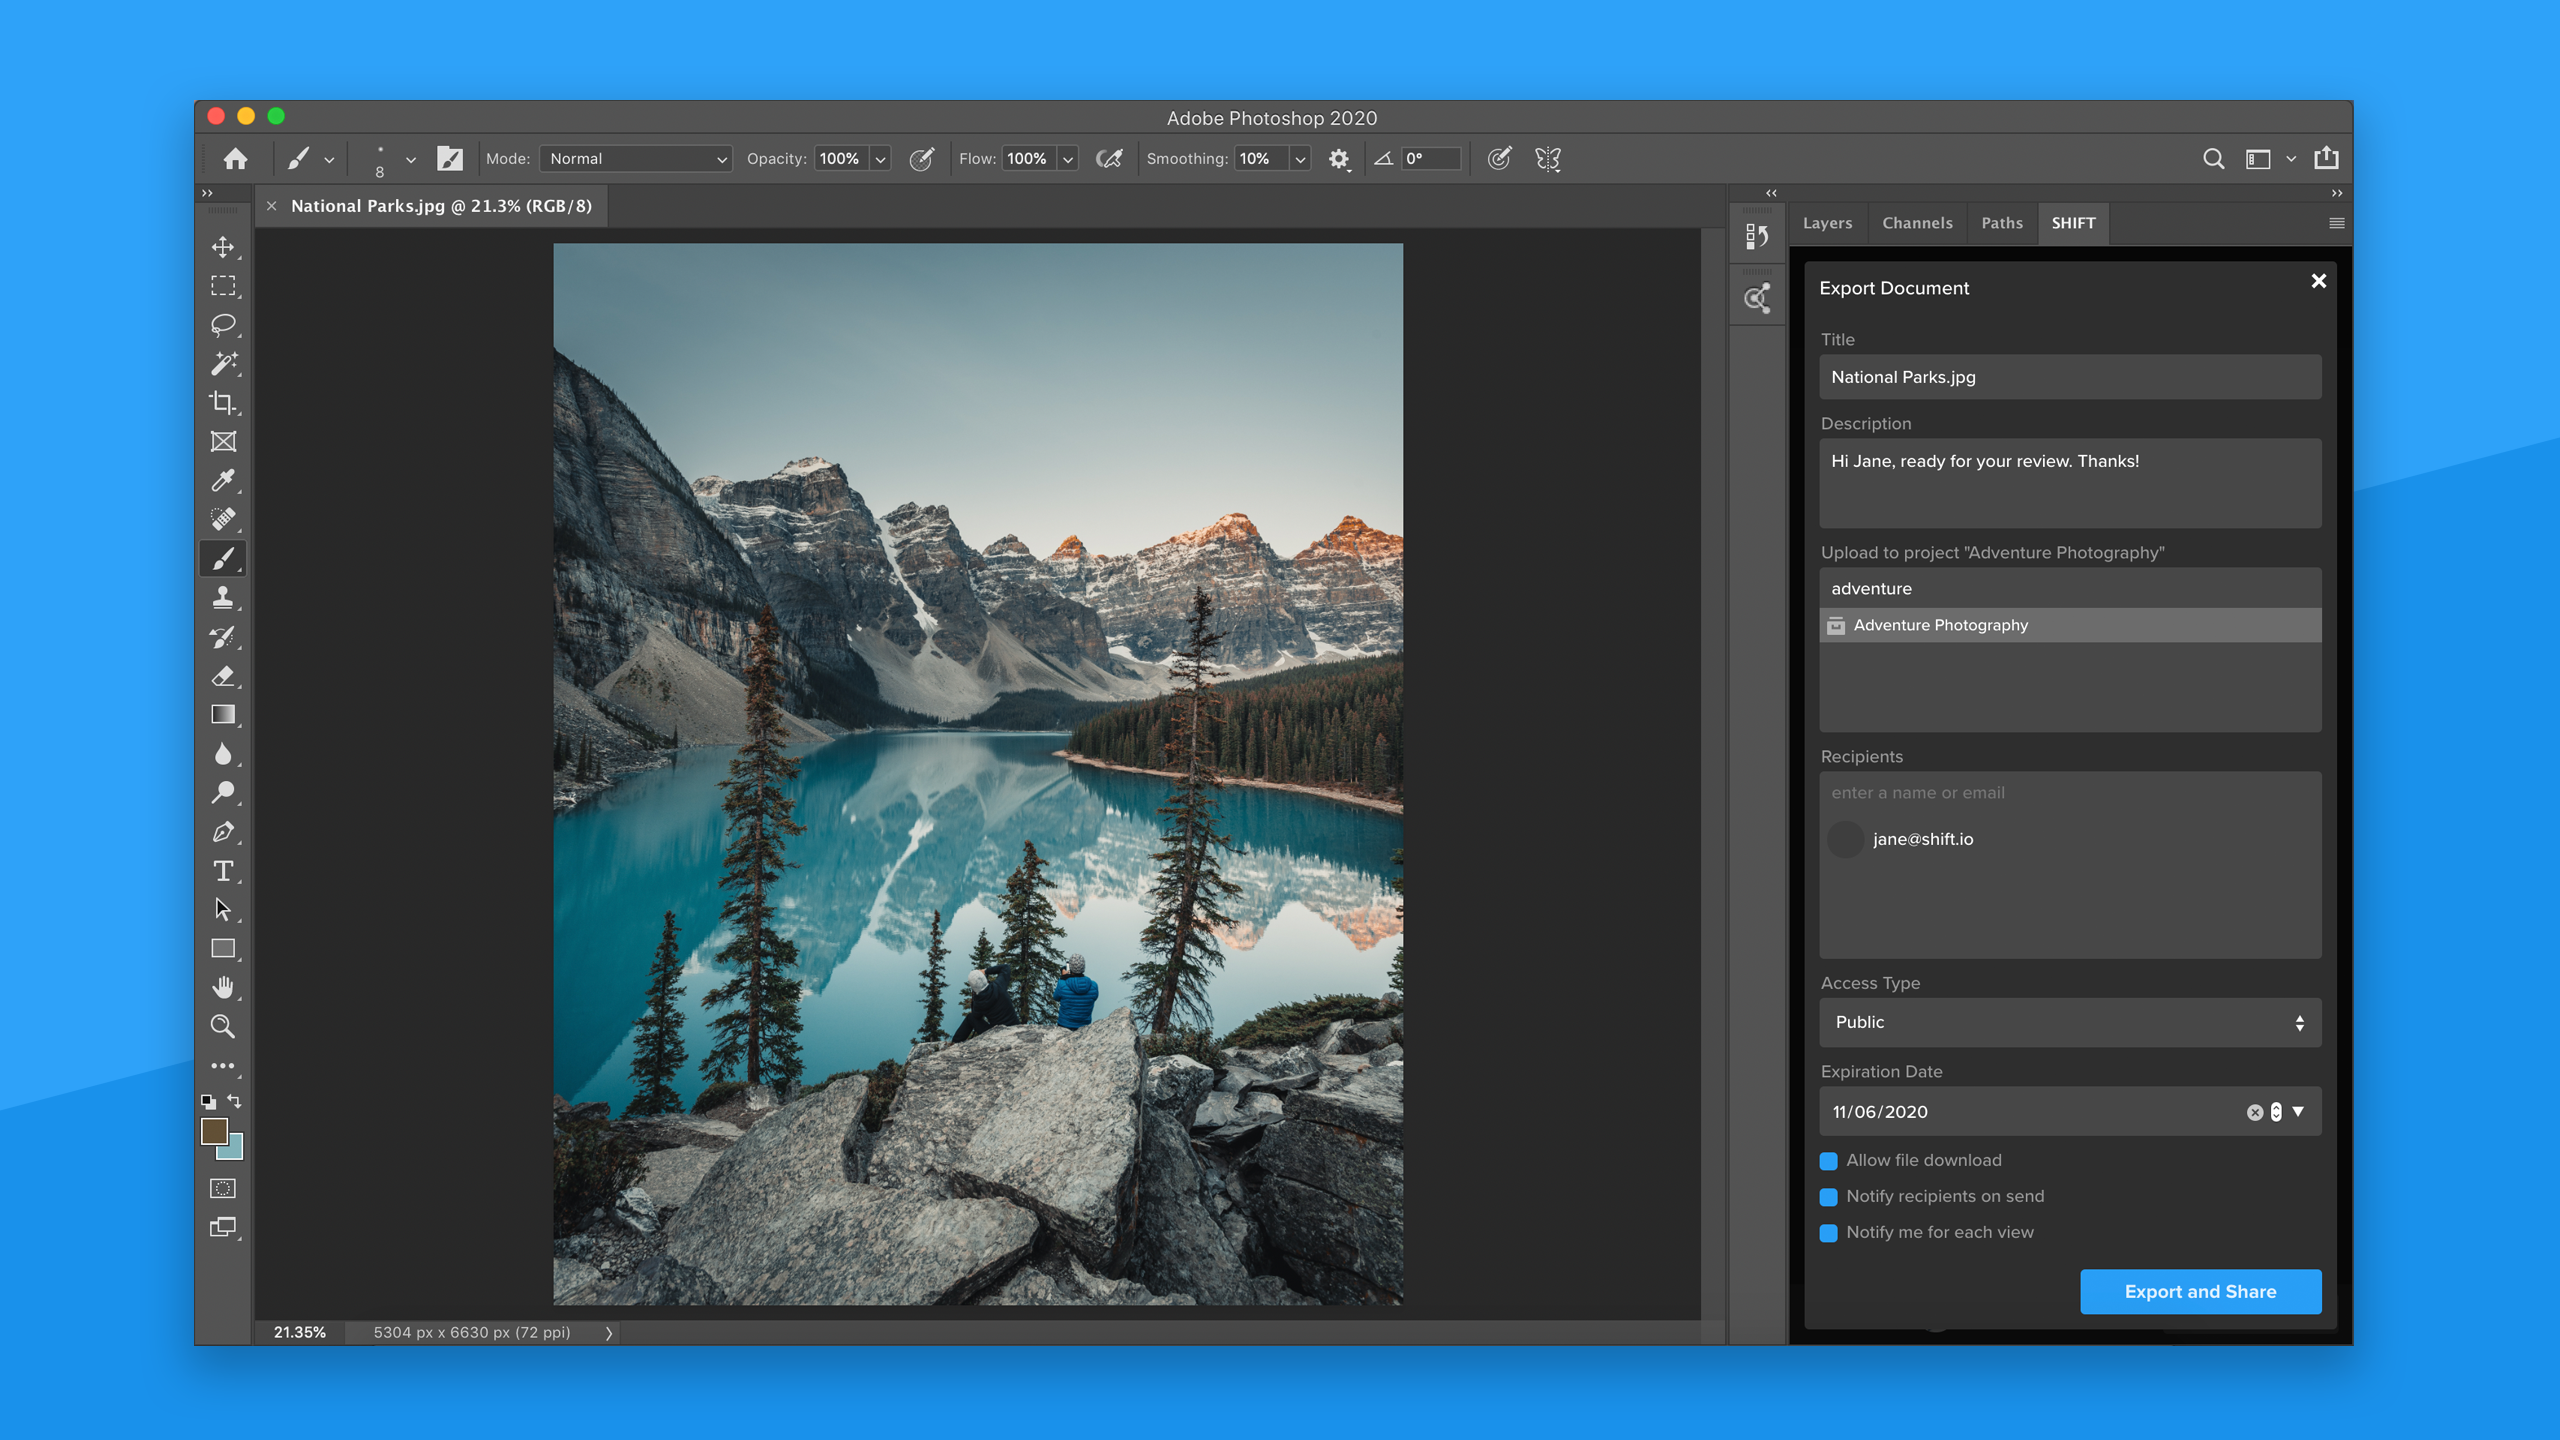 Adobe_Panel_Shots_ps_export_modal_R1_R1